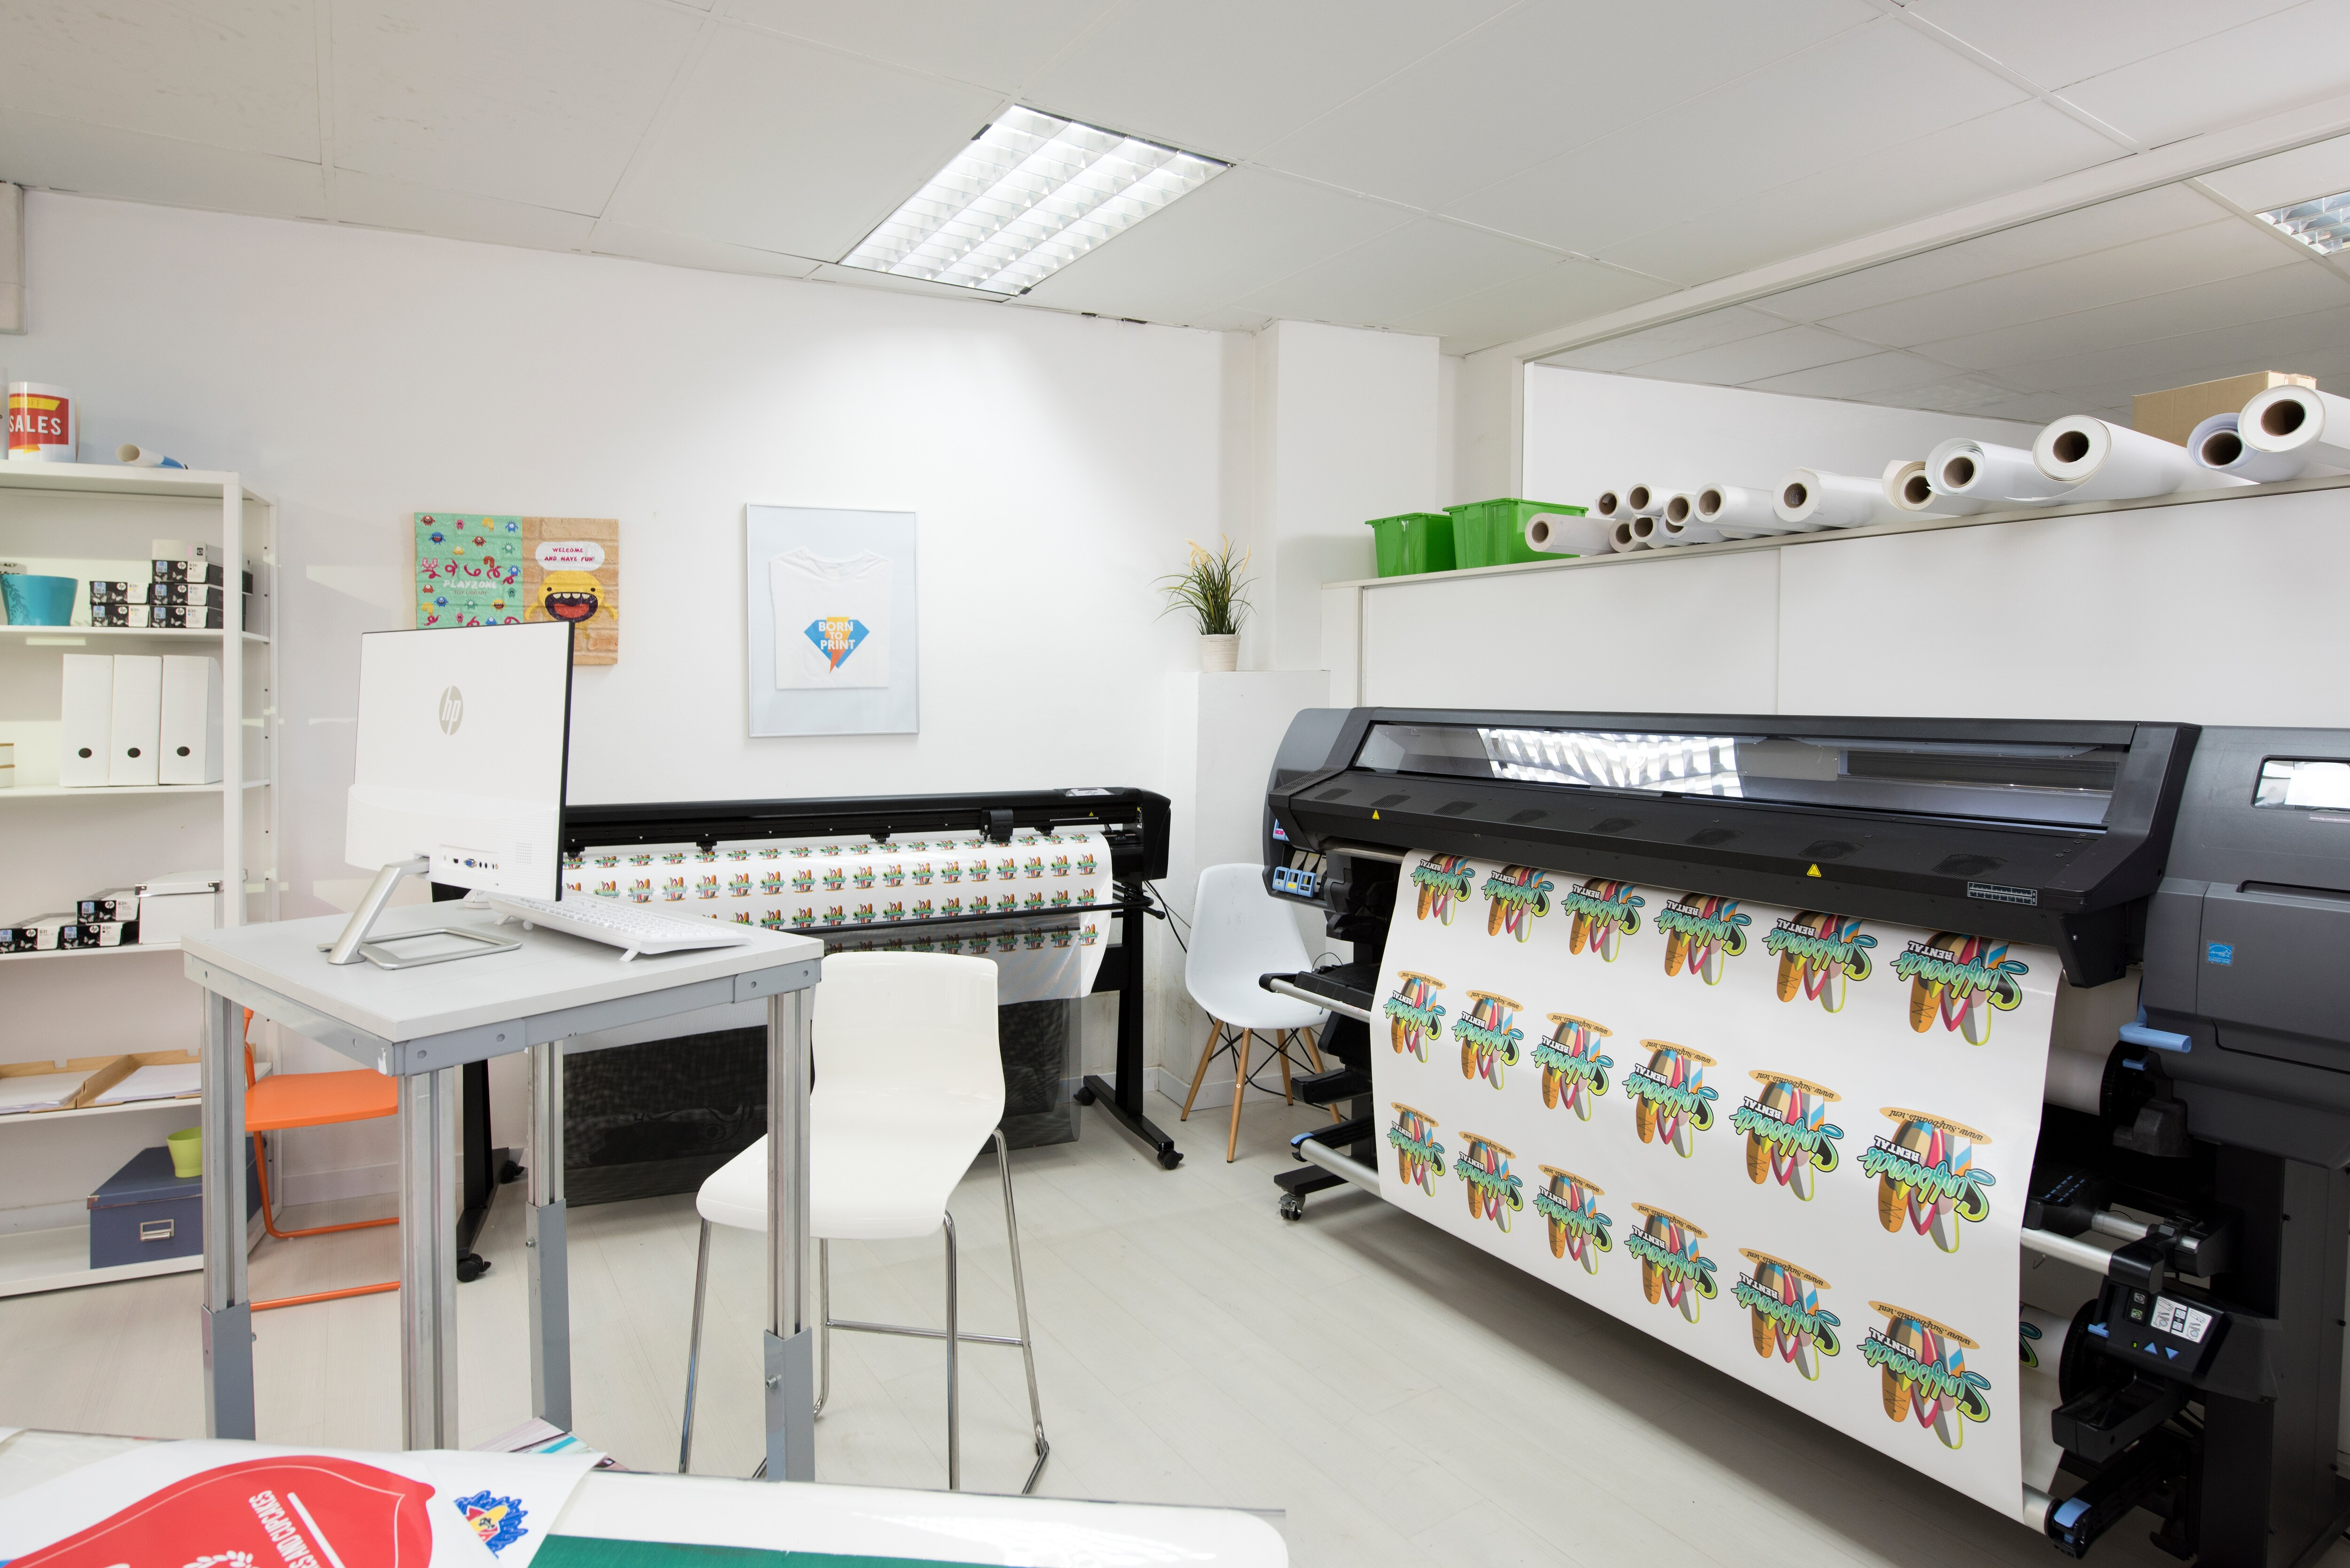 Программно-аппаратный комплекс для широкоформатной печати и плоттерной резкиHP Latex 335 Print and Cut Solution - фото 4